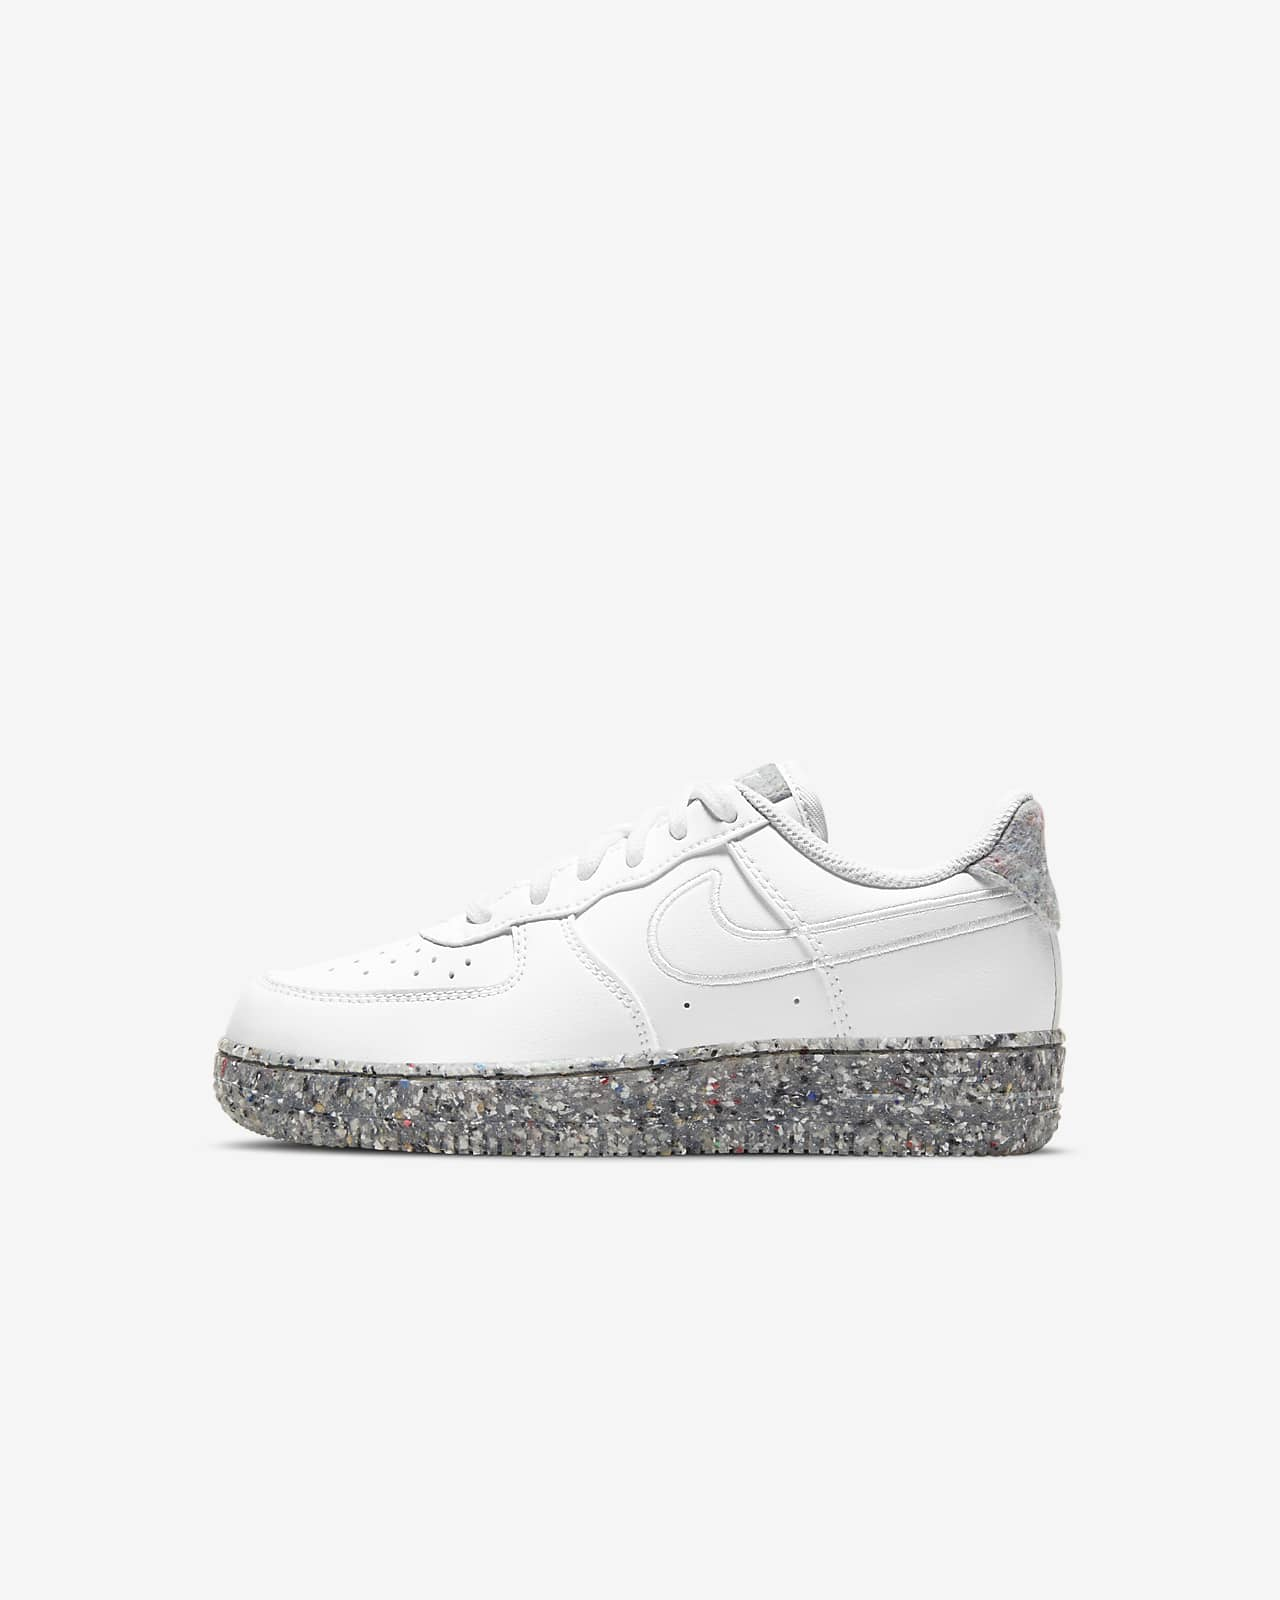 Nike Force 1 Impact Schuh für jüngere Kinder